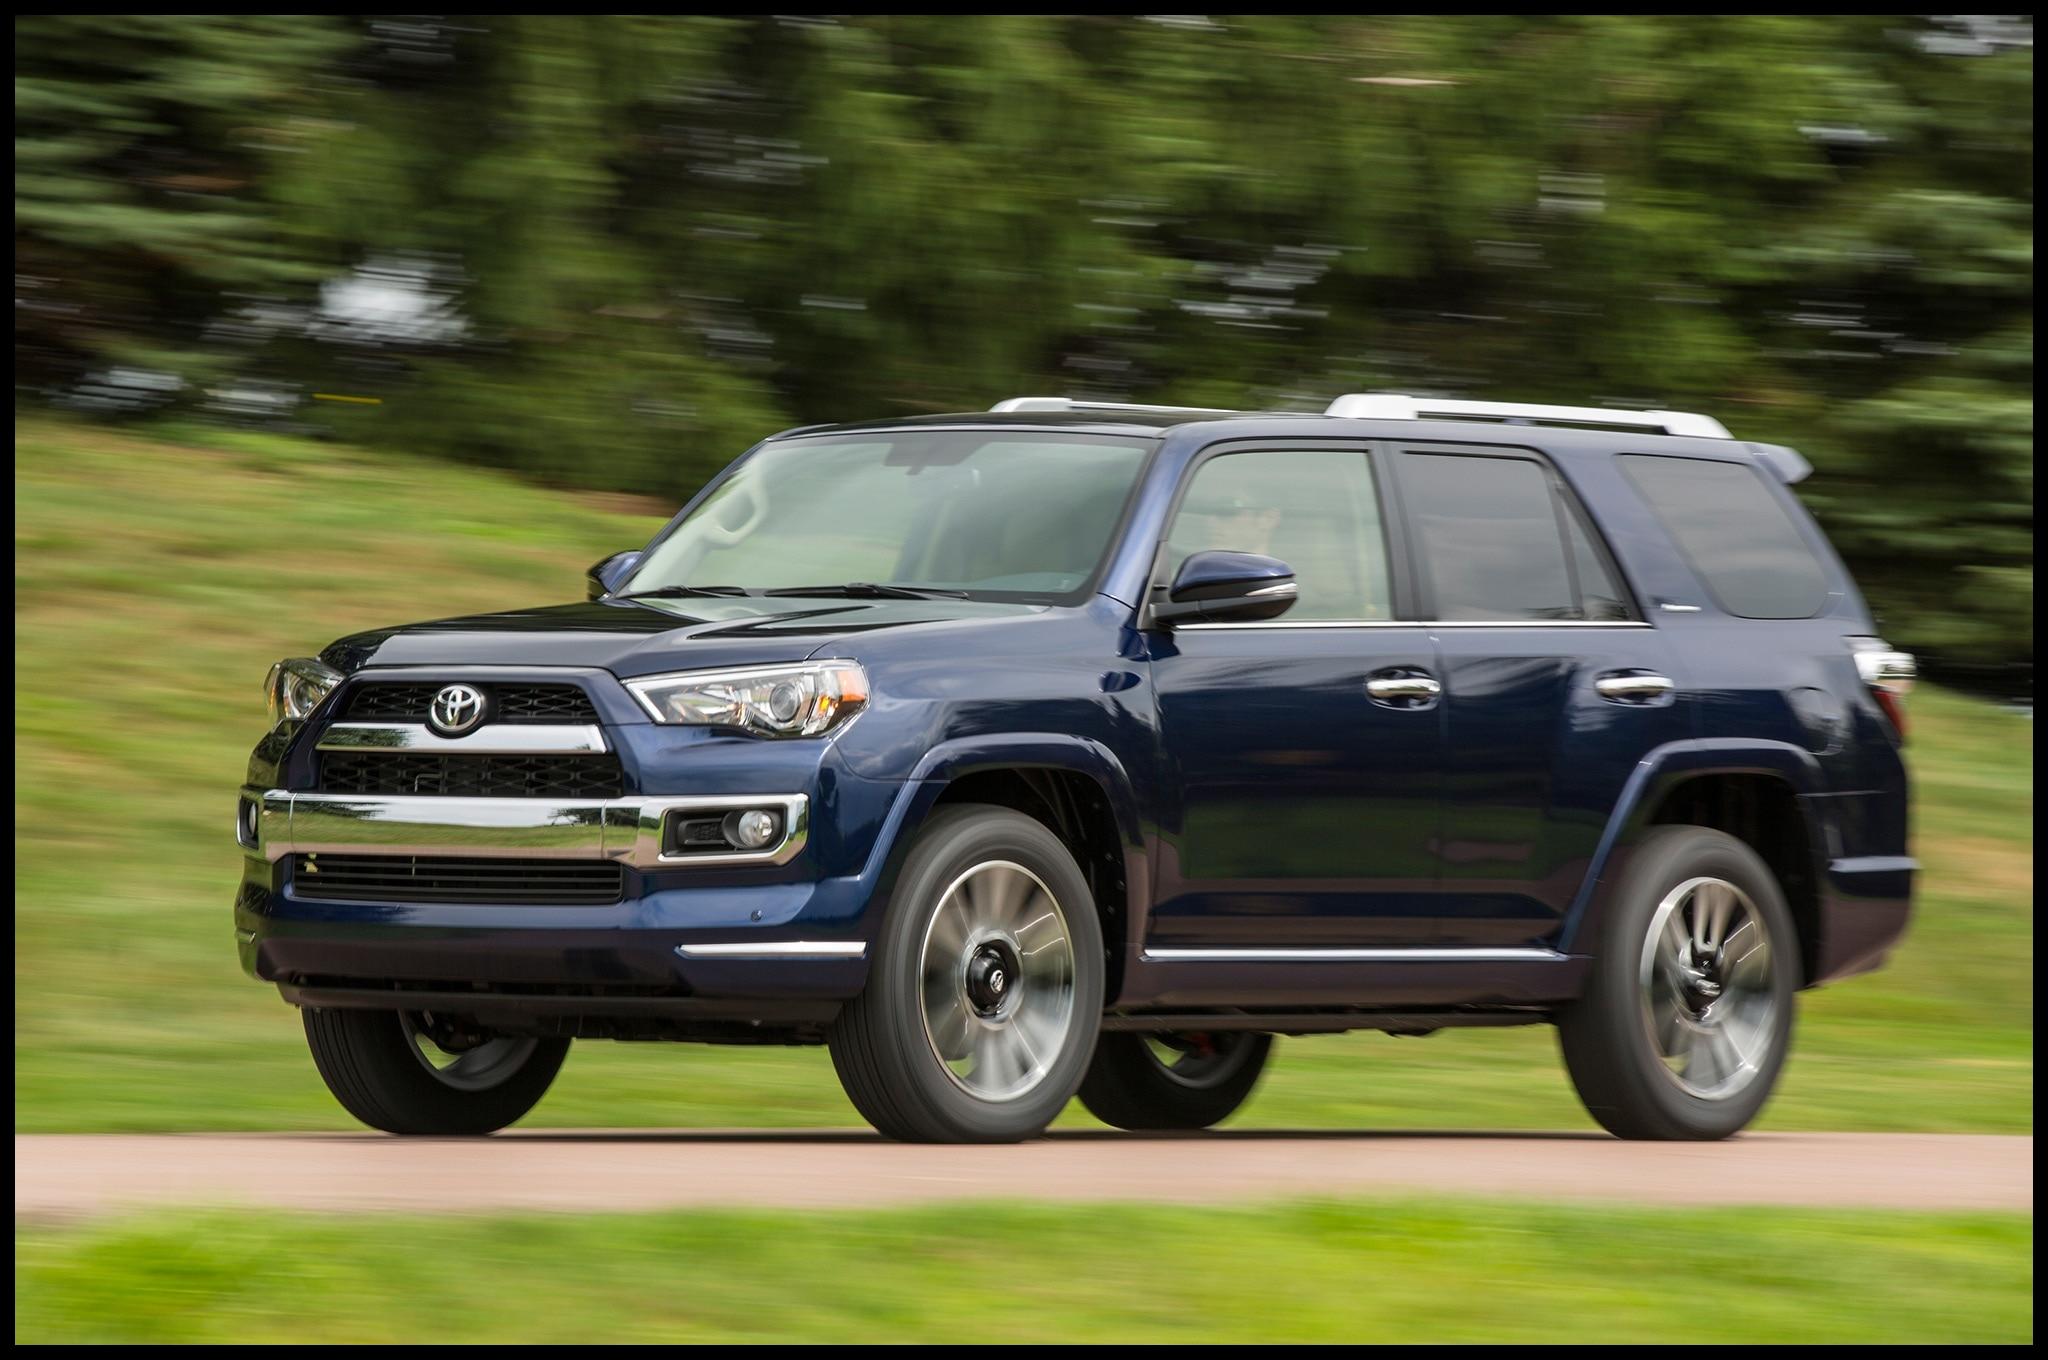 Toyota 4 Runner 2016 Toyota 4Runner Reviews and Rating